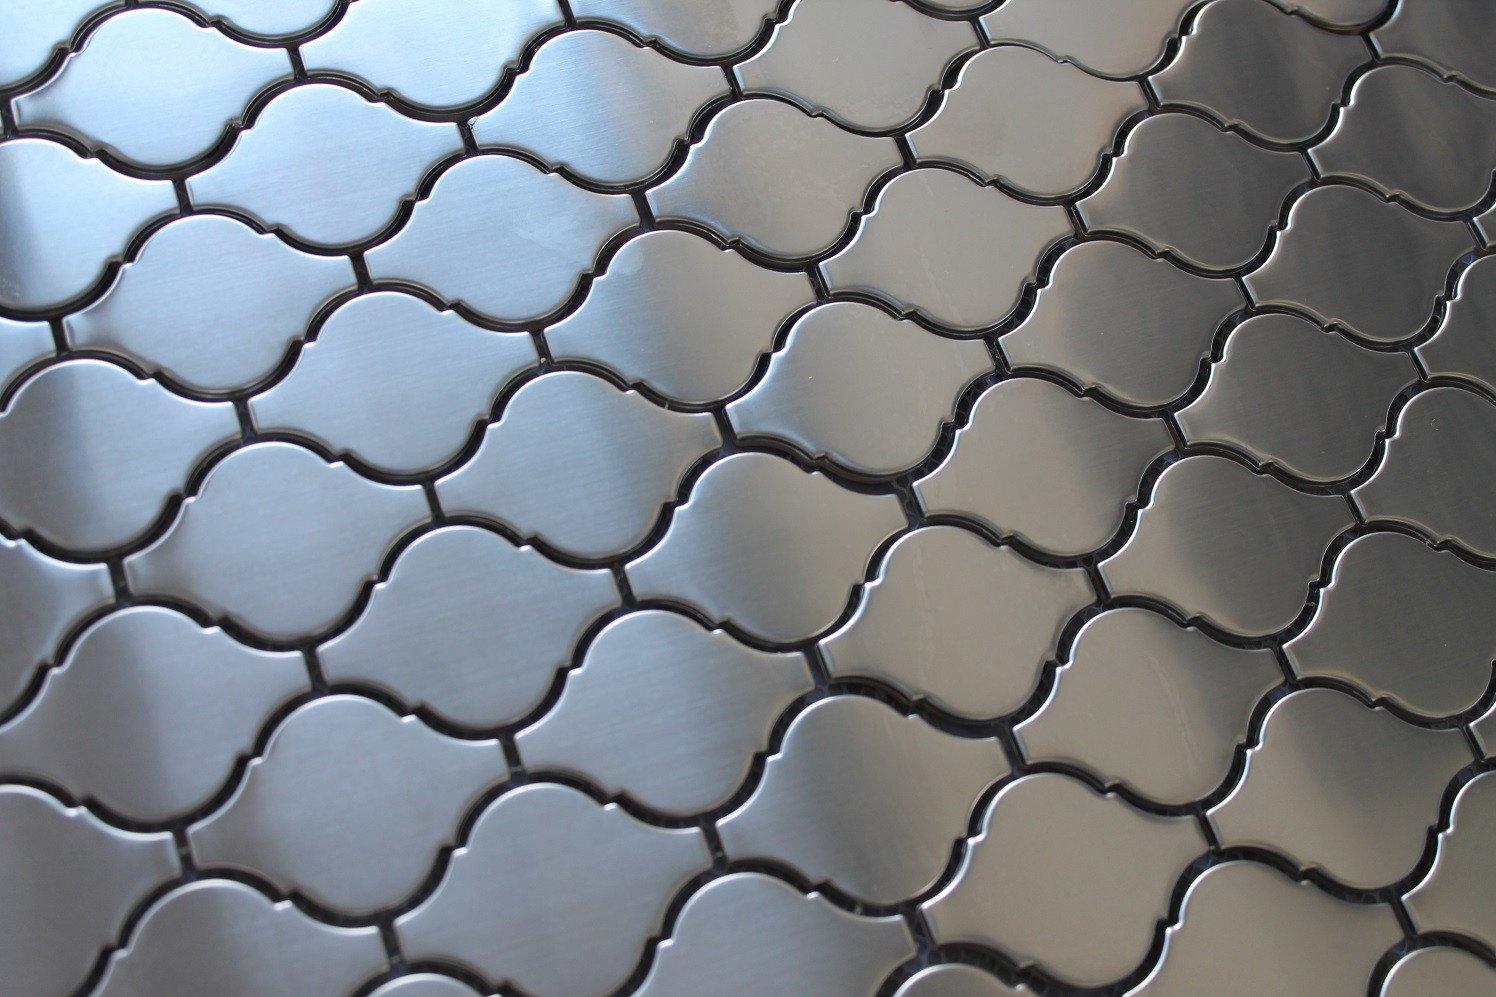 10 Square Feet - Stainless Steel Arabesque Mosaic Tiles